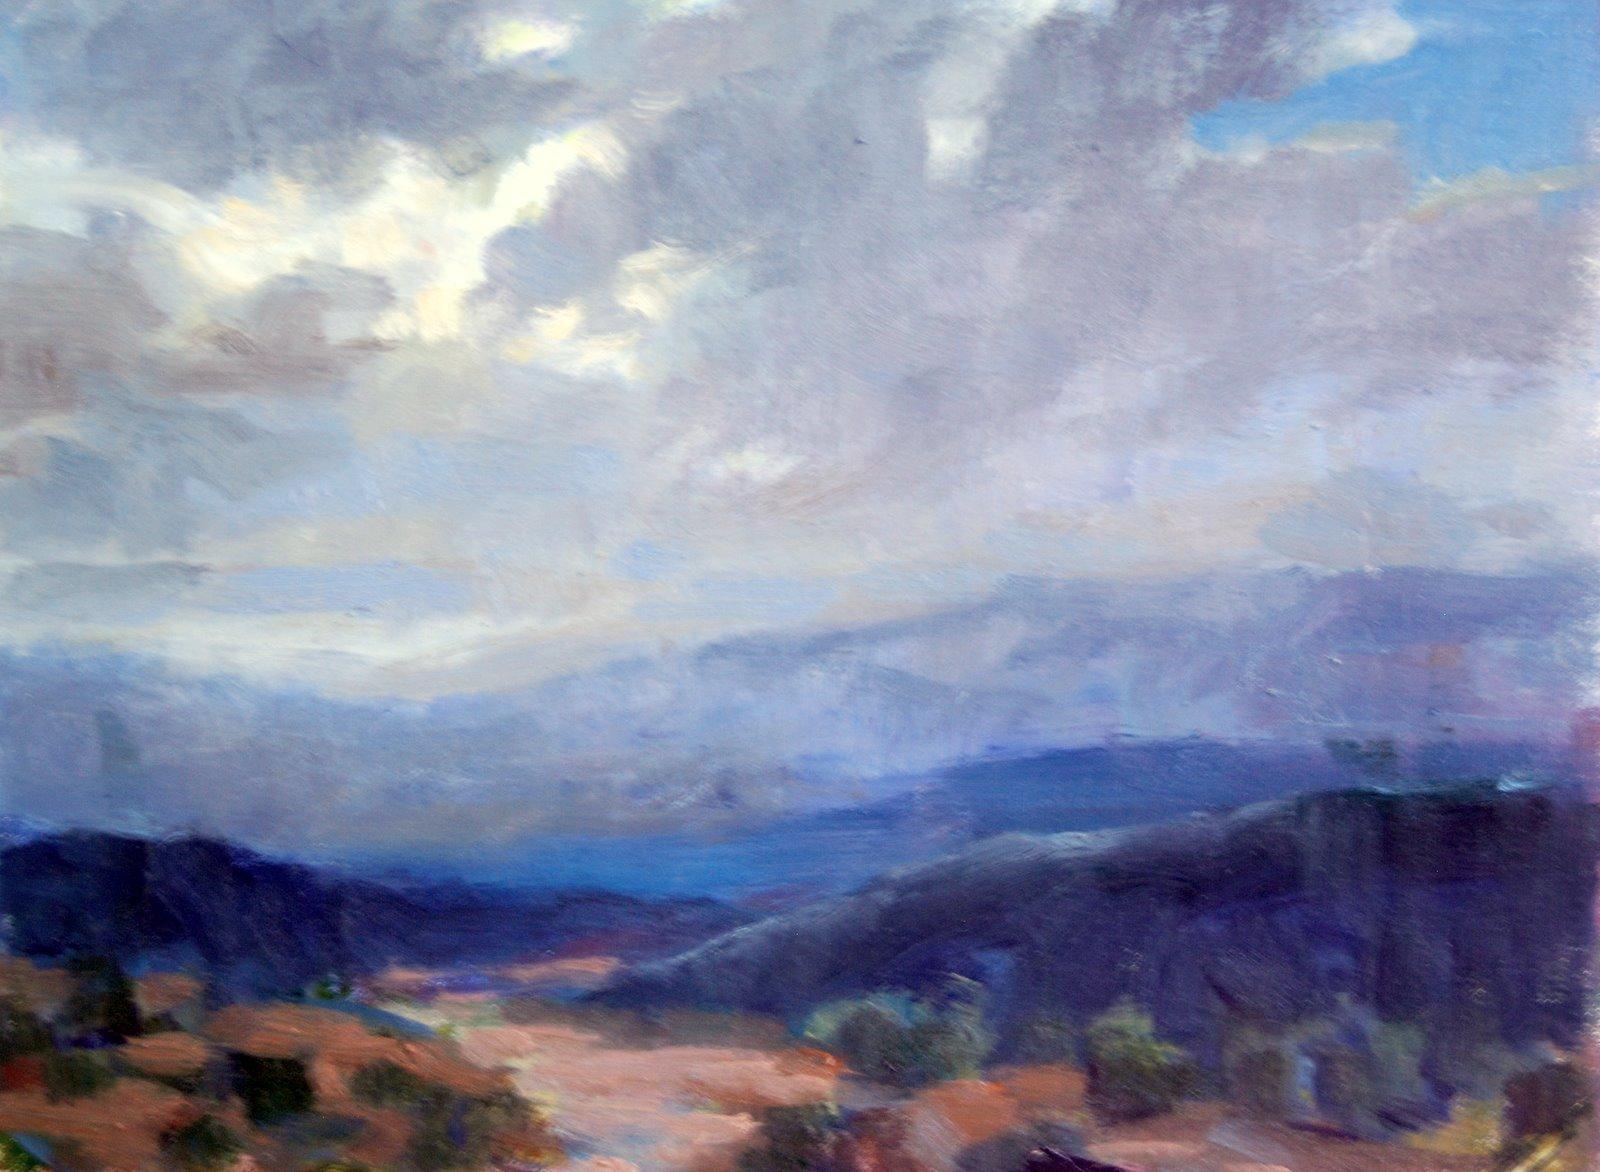 """Stormy Sky in Tucson, AZ"" original fine art by Julie Ford Oliver"